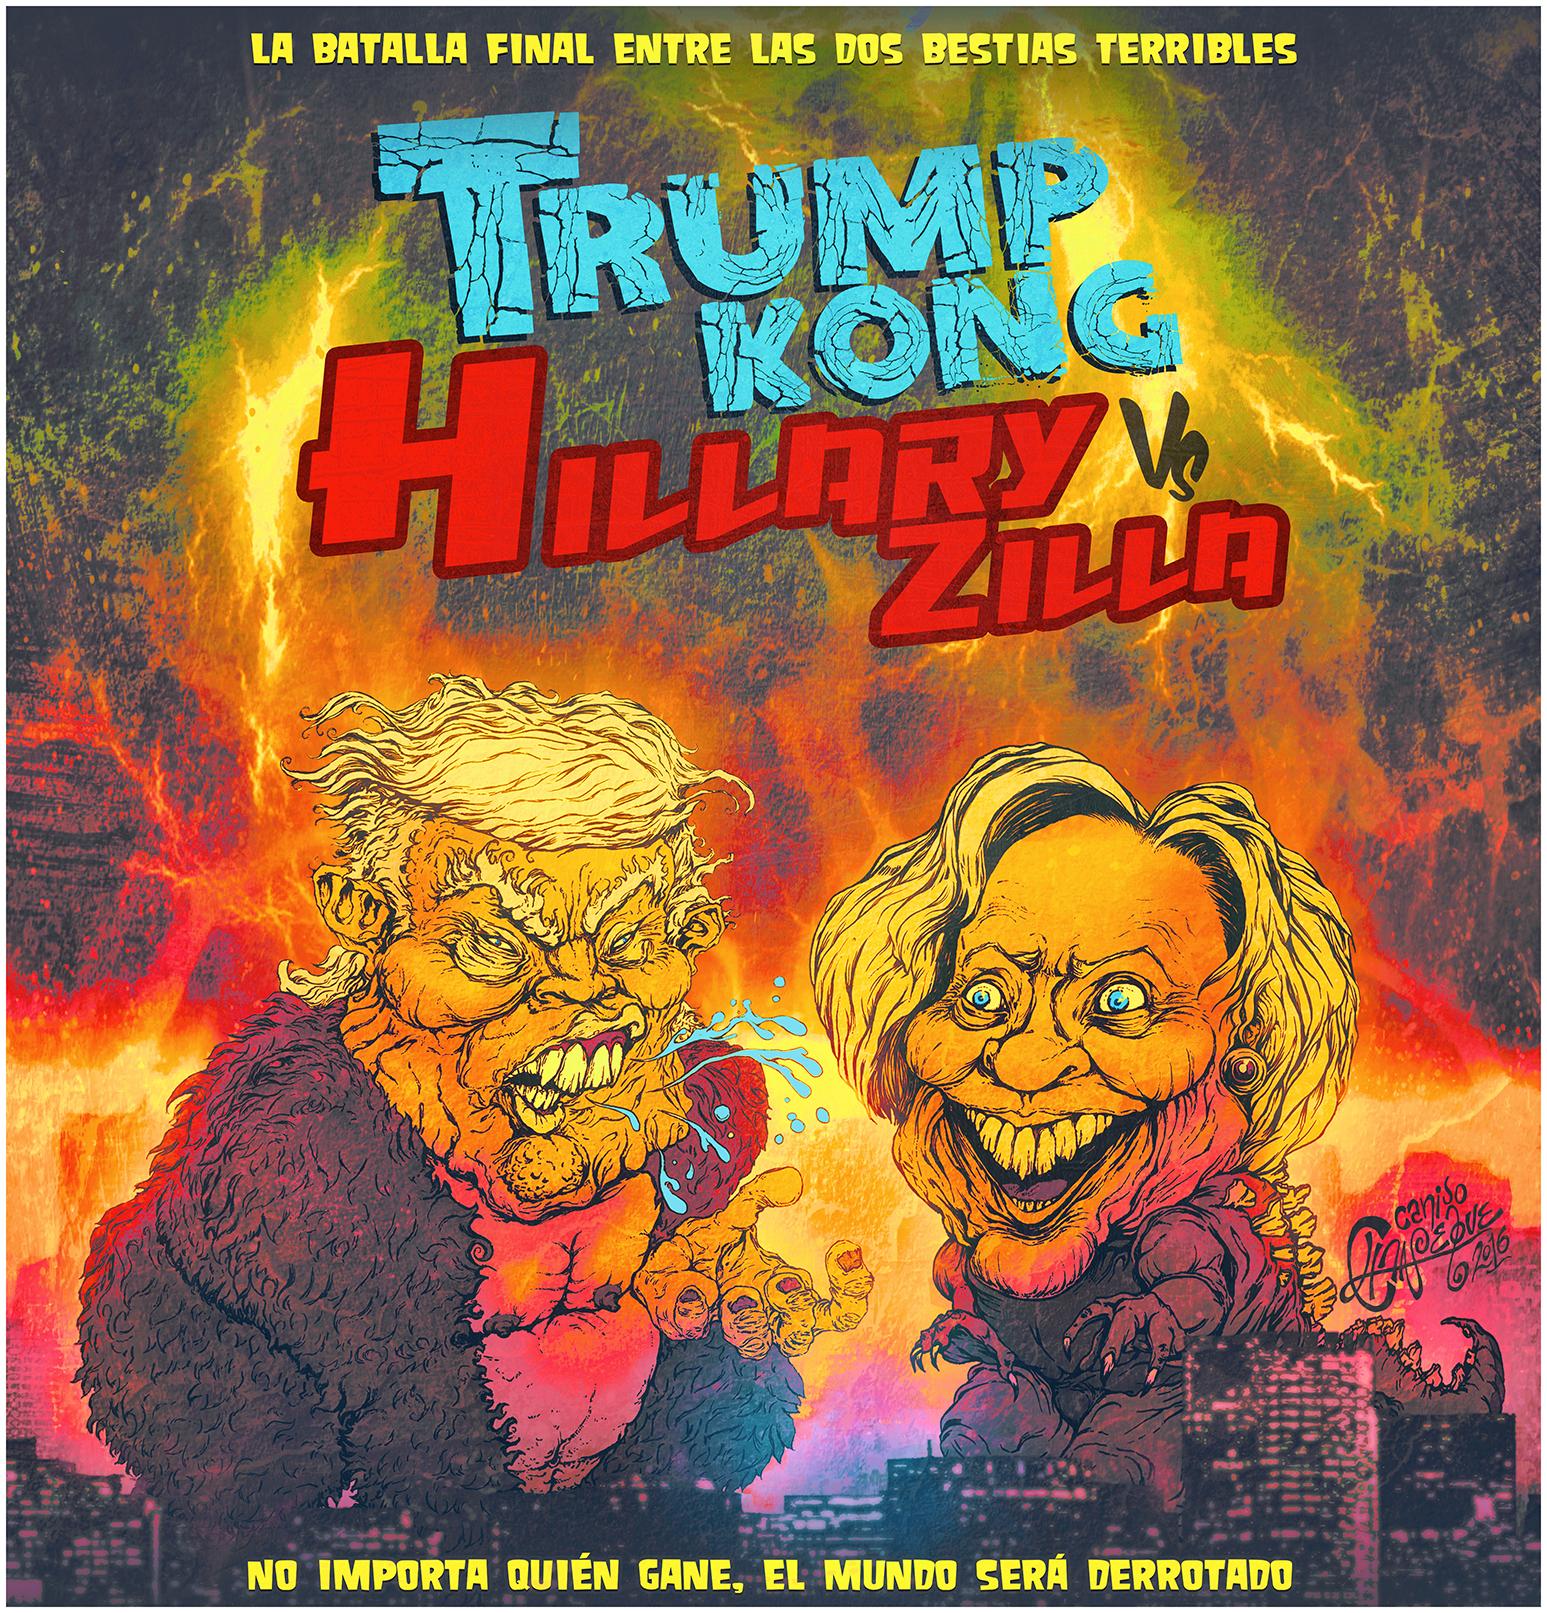 Trump Kong vs Hillary Zilla